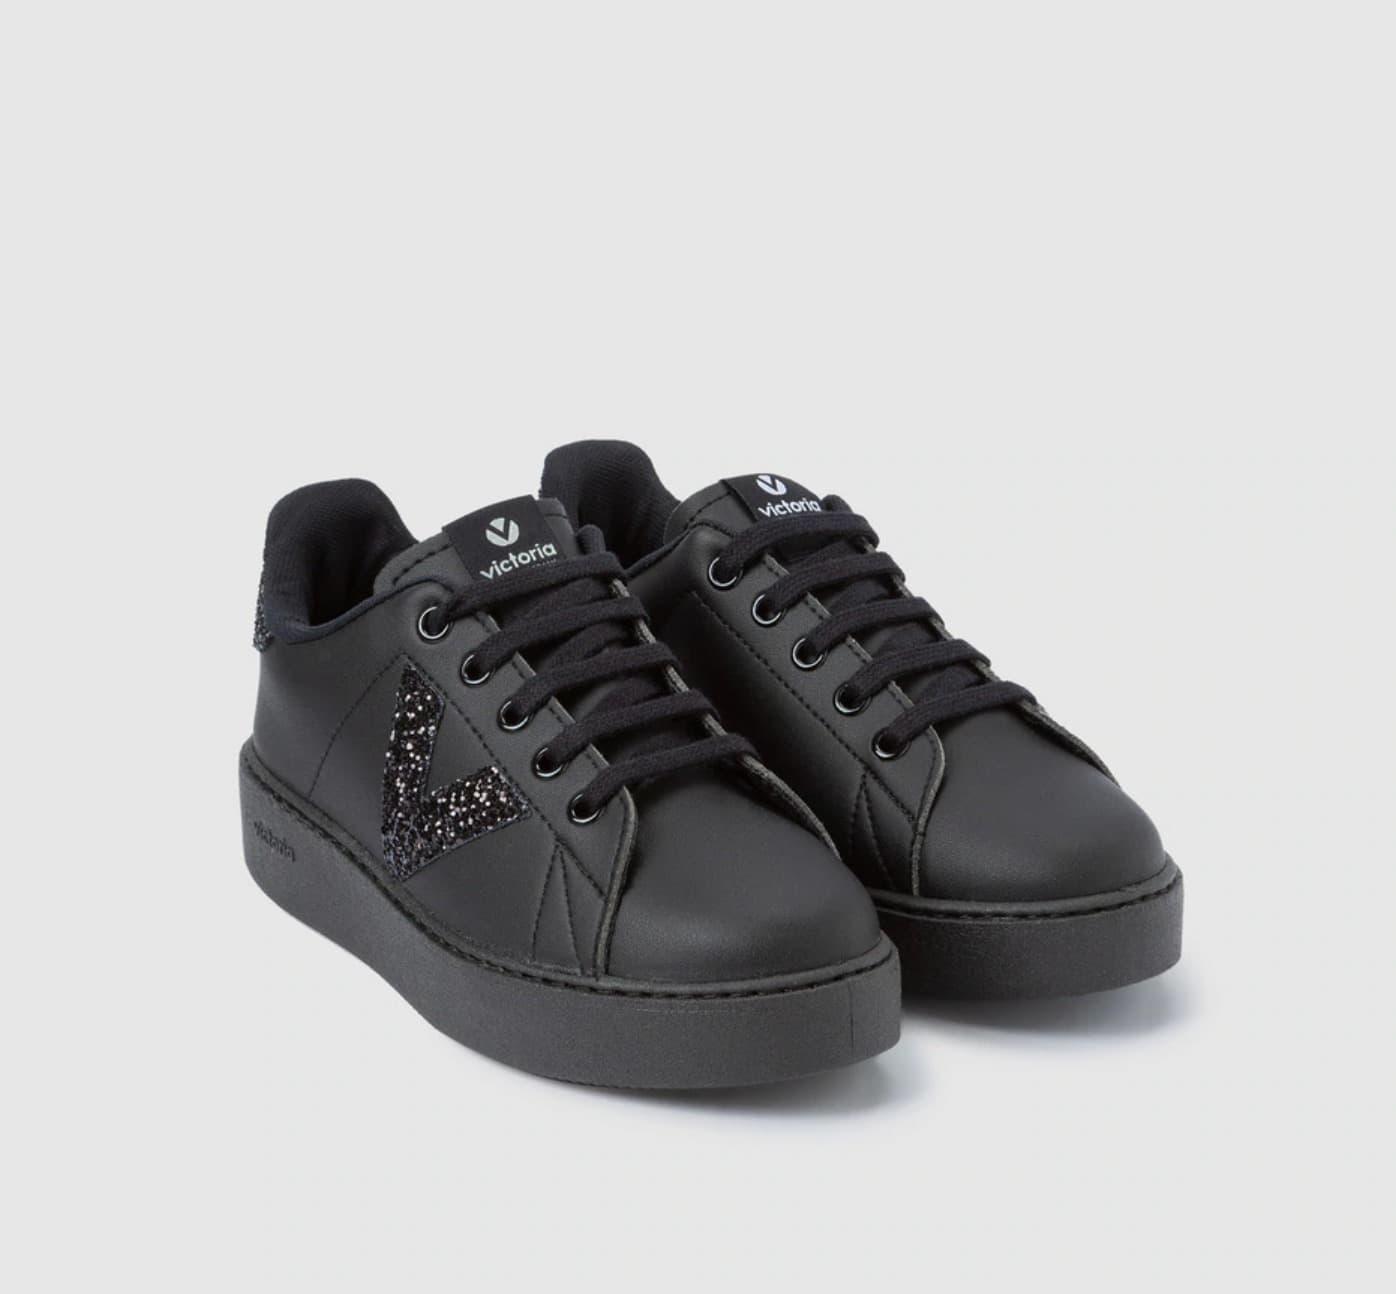 Zapatillas deportivas de niña Victoria de color negro con detalle glitter